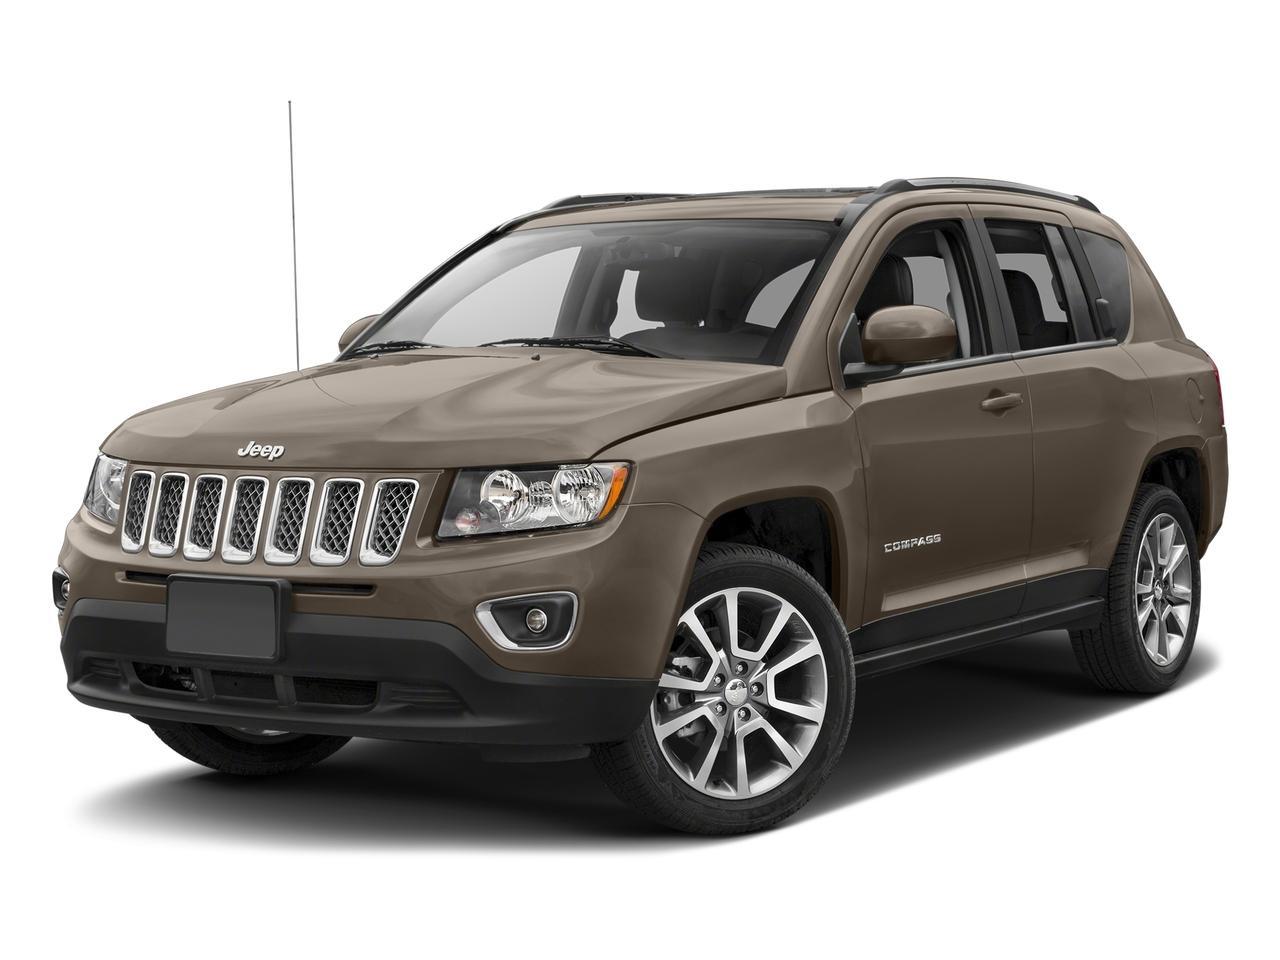 2017 Jeep Compass Vehicle Photo in Tucson, AZ 85711